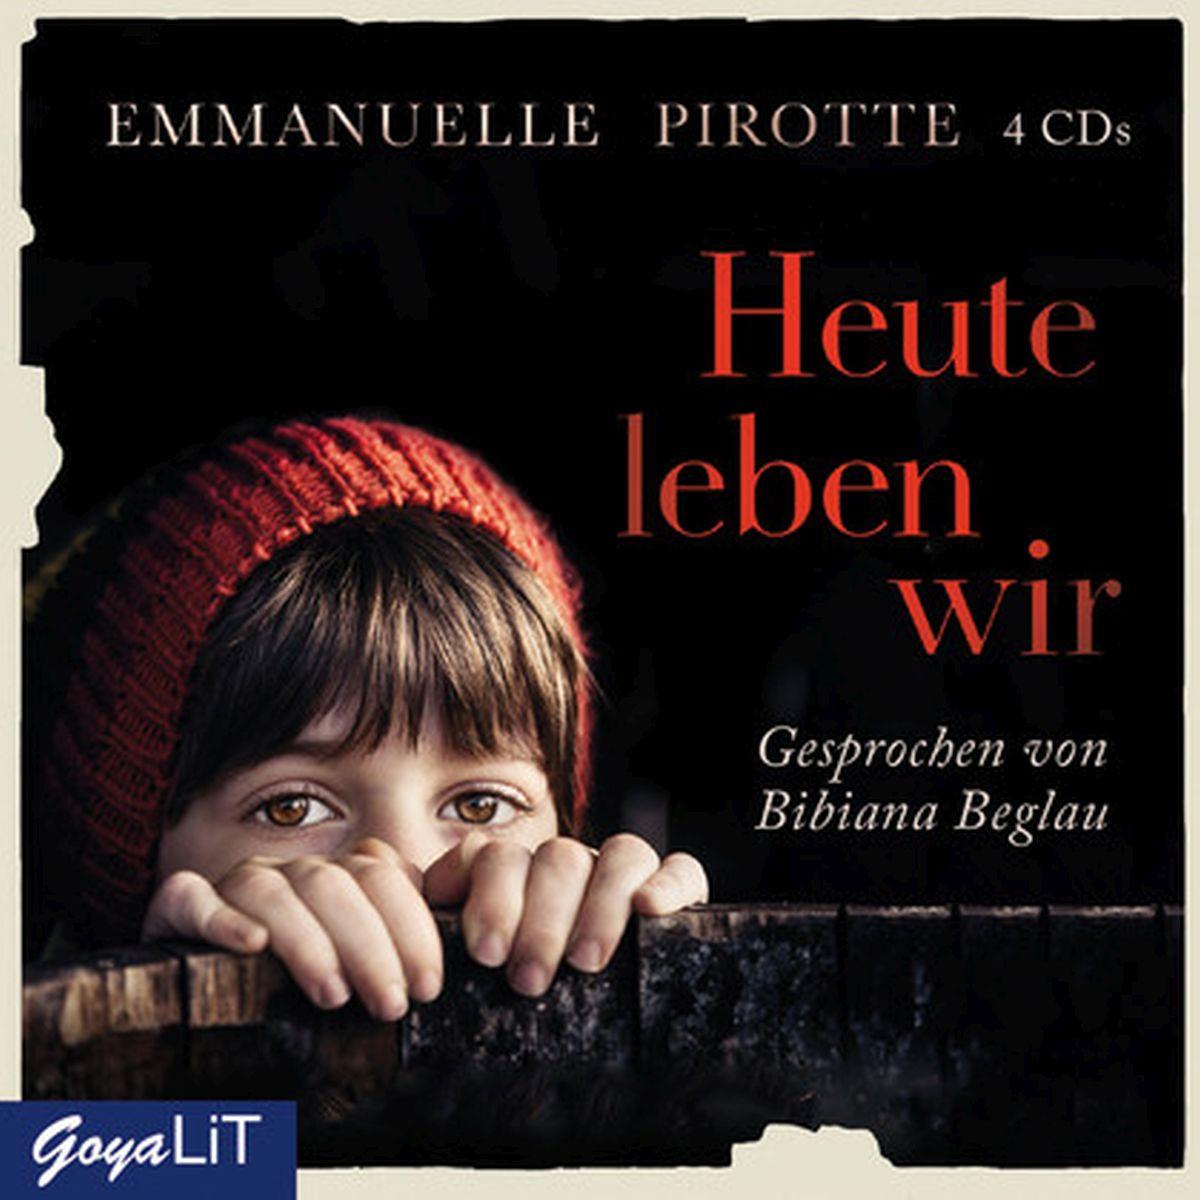 Emmanuelle Pirotte: Heute leben wir